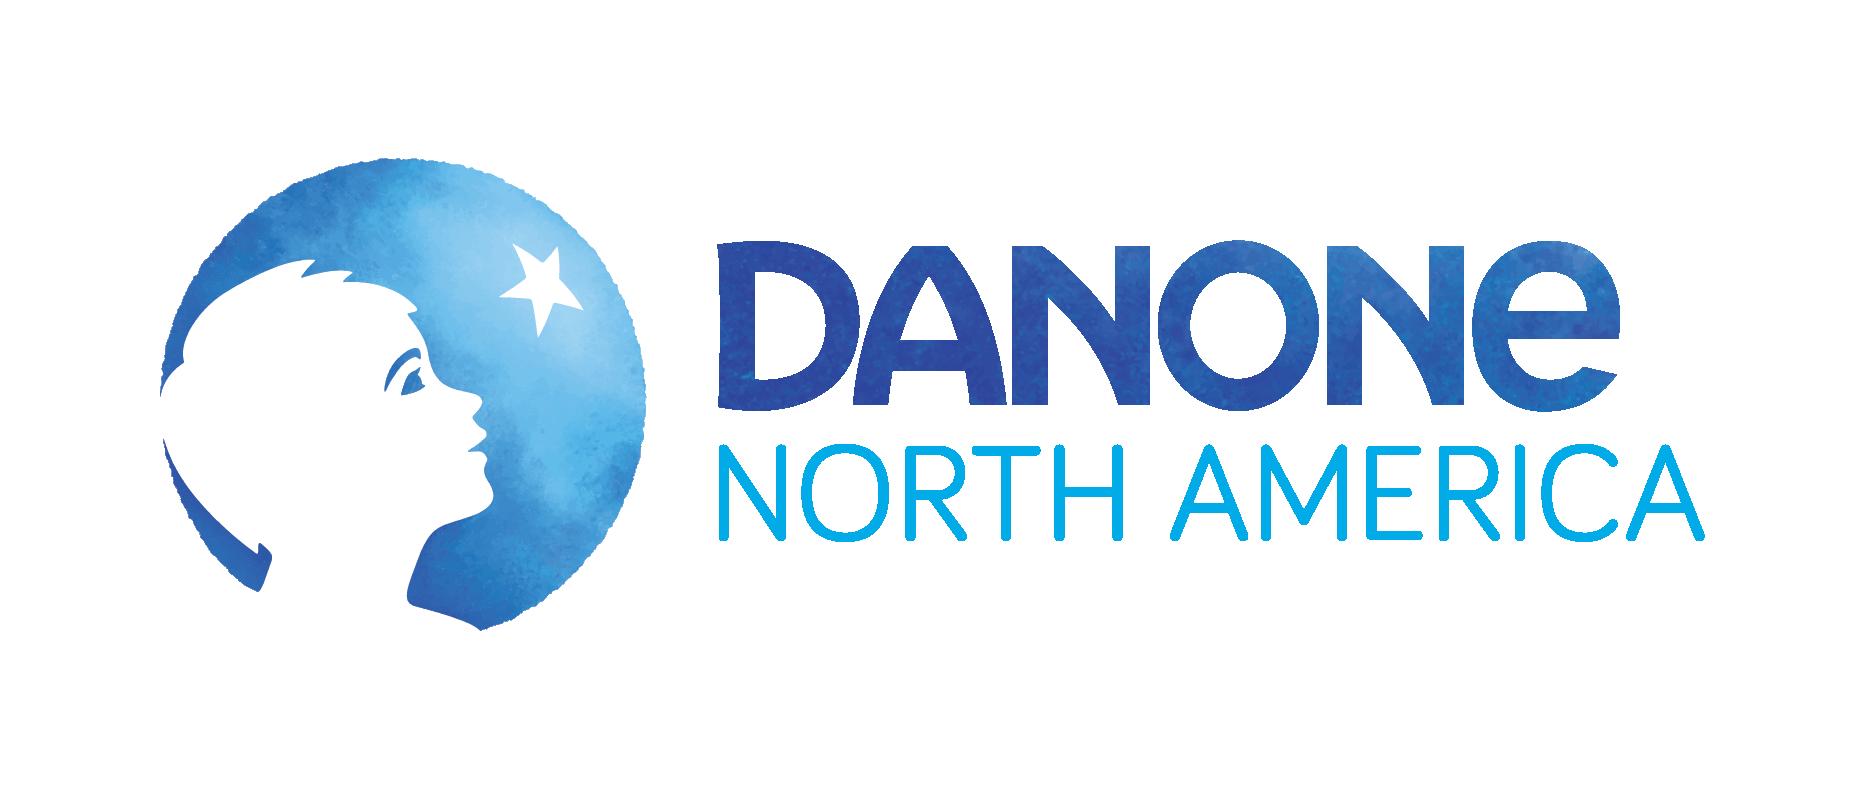 DanoneNorAm_Logo_Horz_(1)_thumb.png